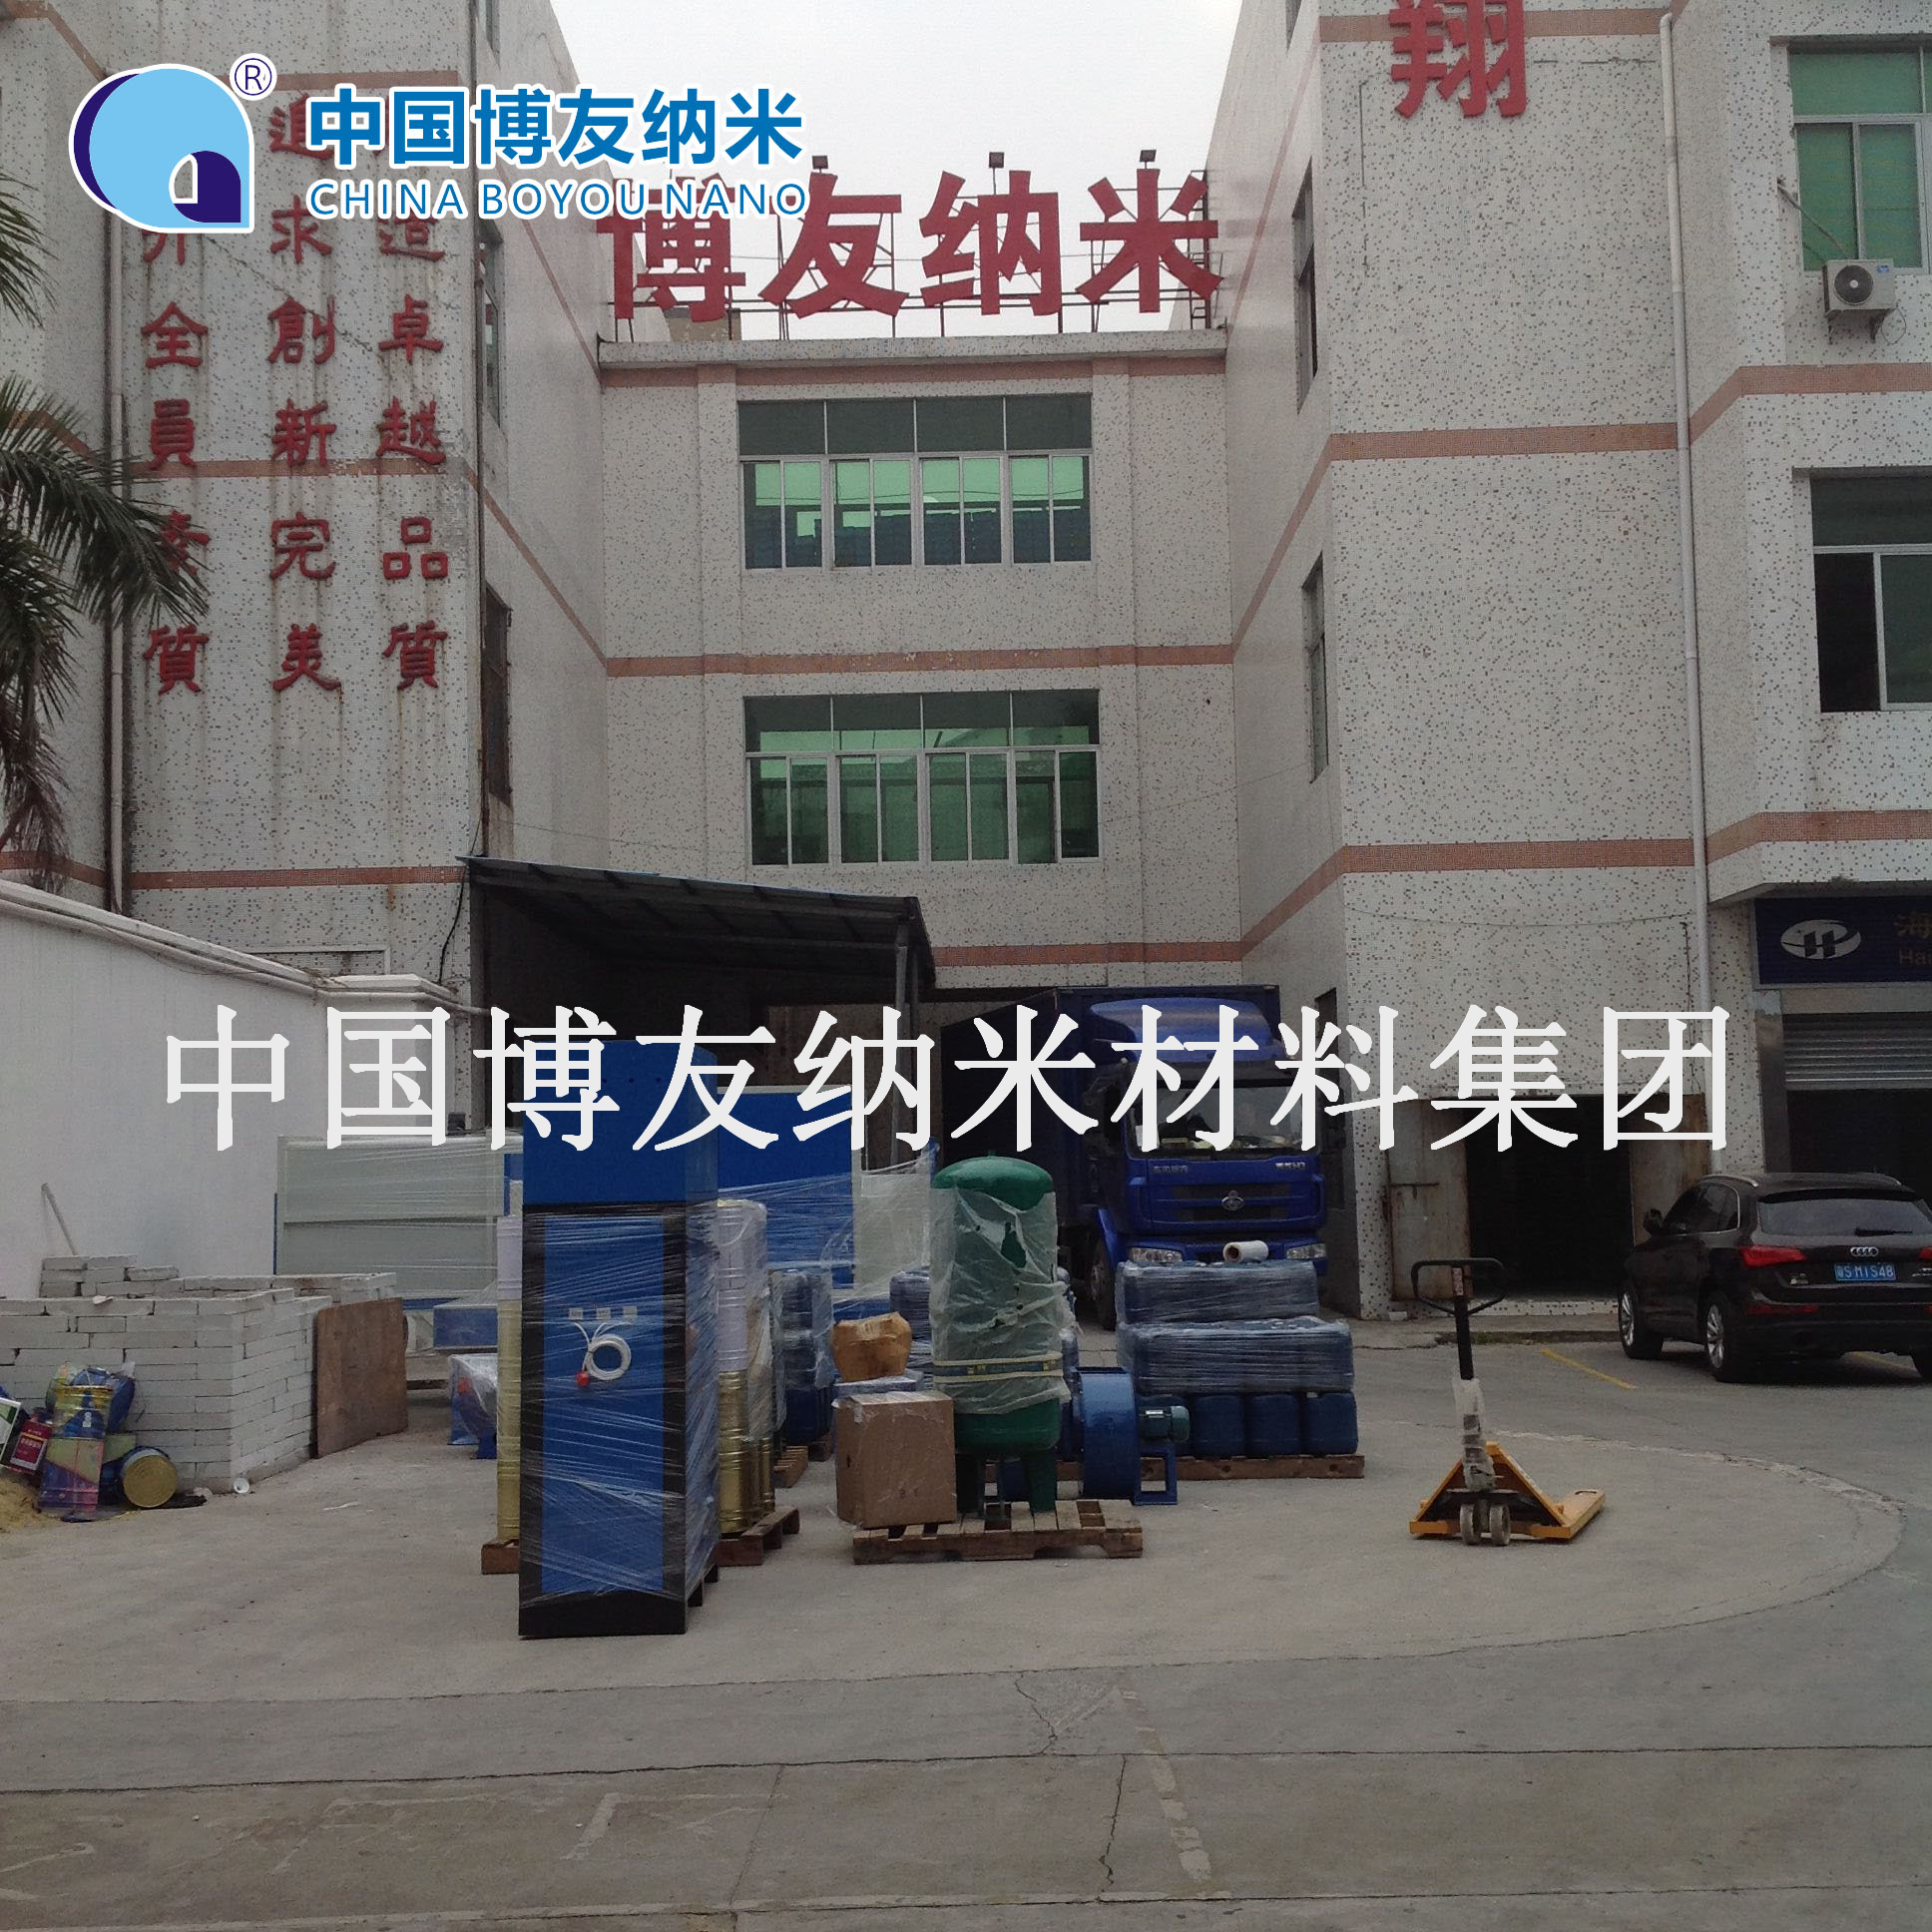 <b>博友纳米喷涂量产视频,纳米喷涂工厂,纳米喷镀加工厂</b>